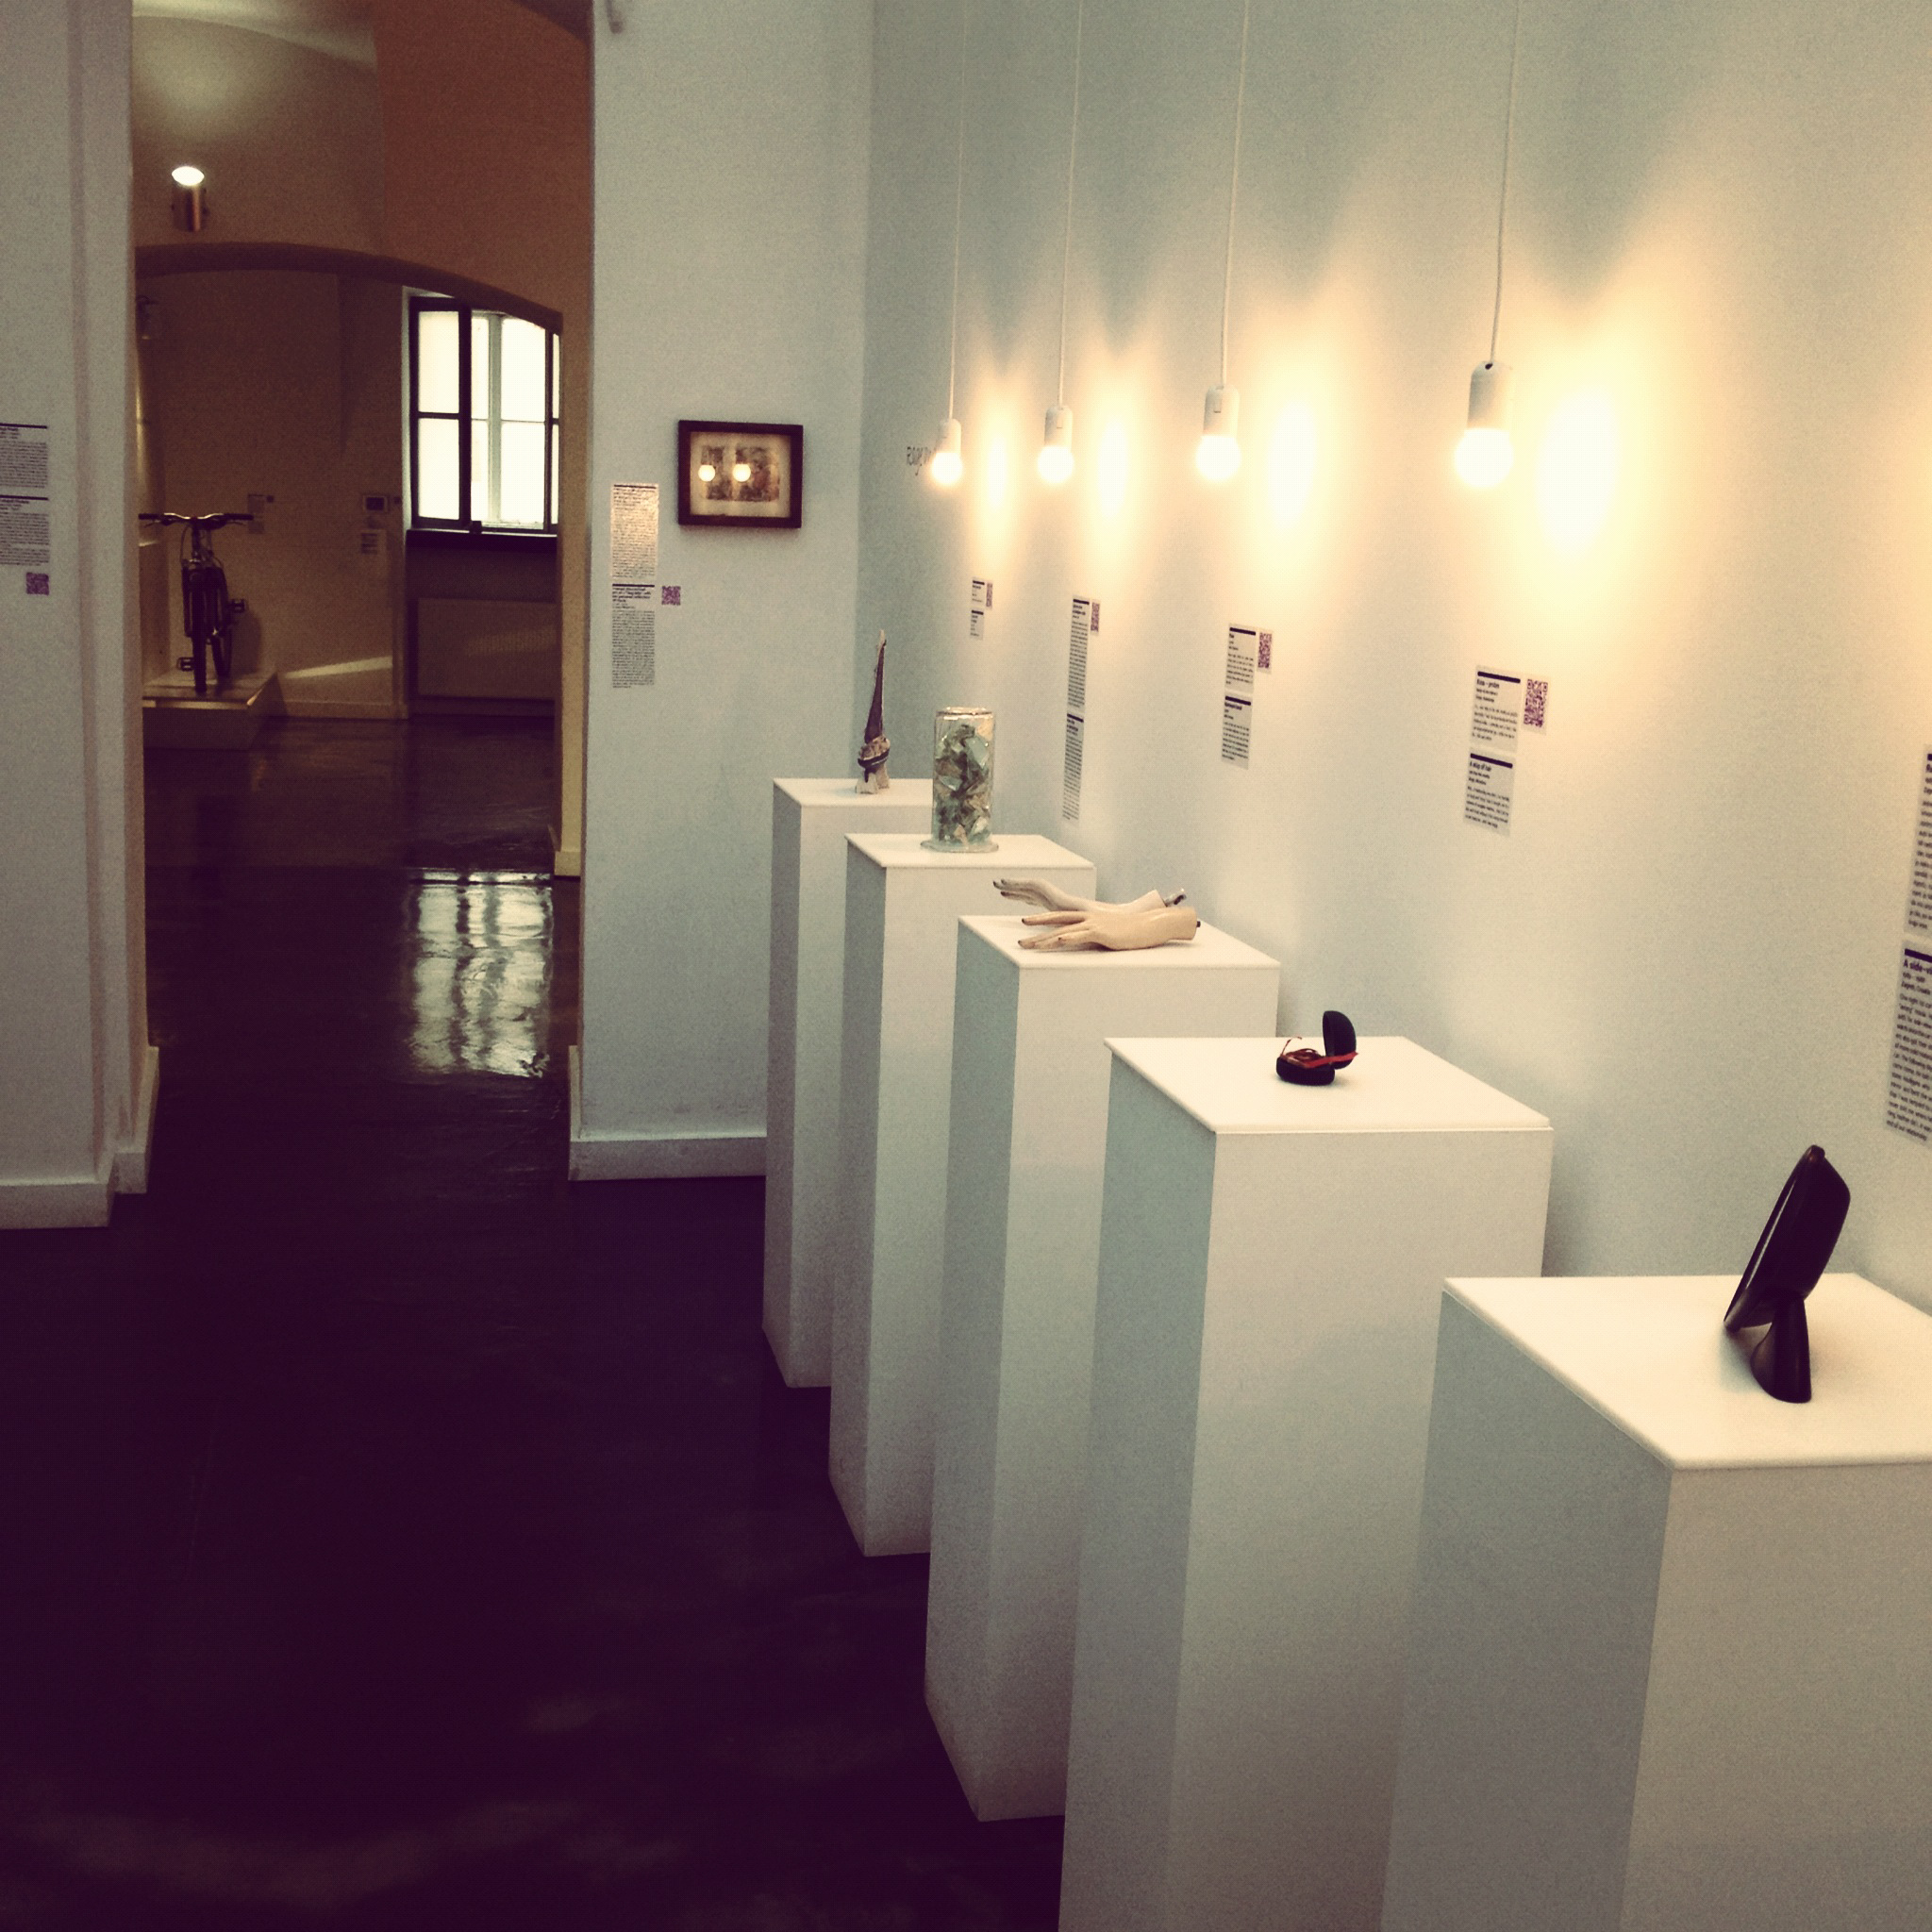 Exhibits at the Museum of Broken Relationships.jpg